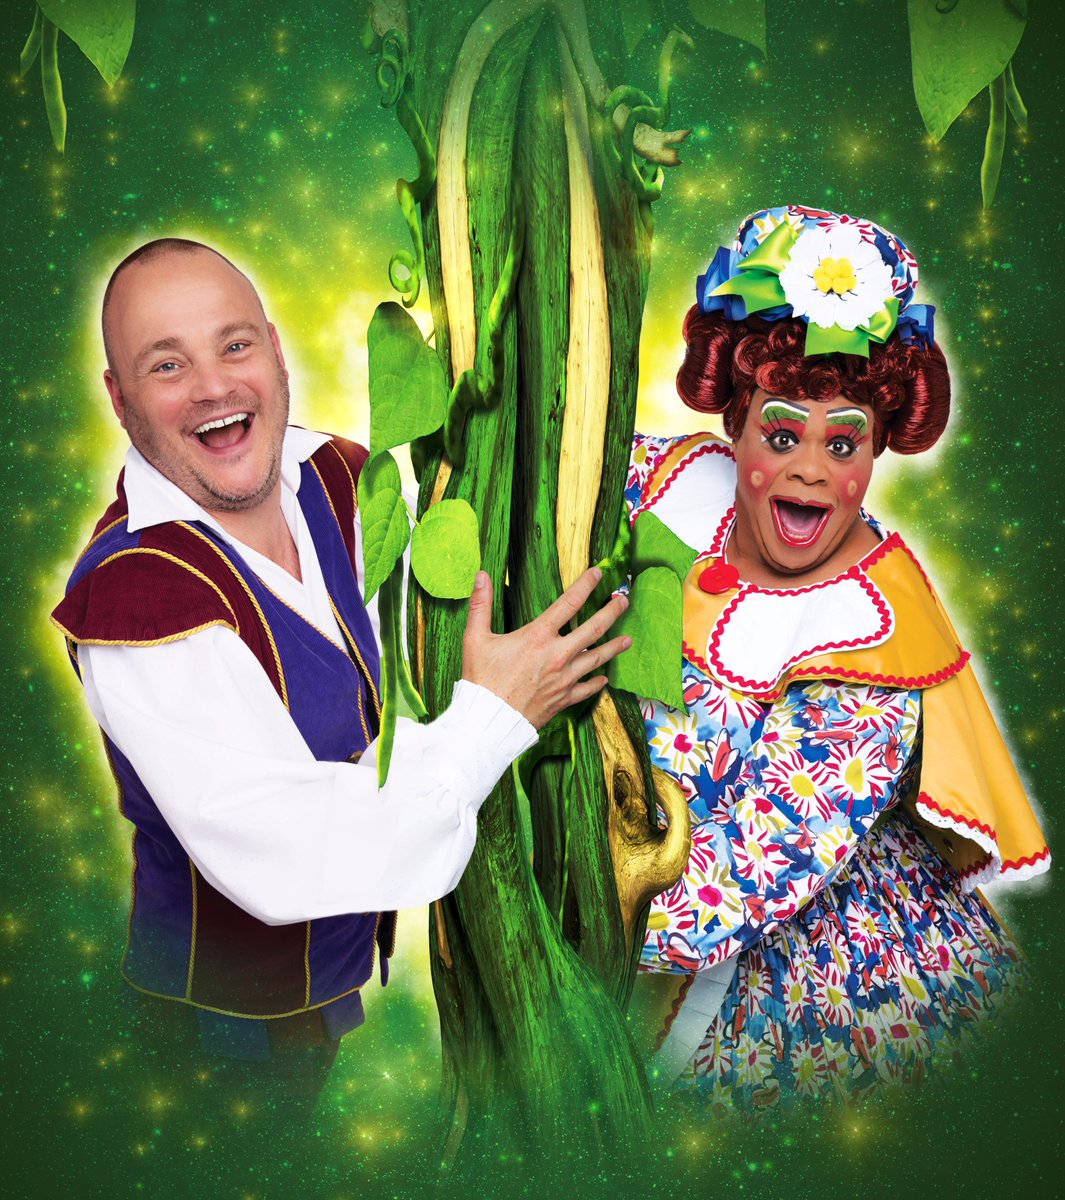 Qdos Entertainment - The World's Biggest Pantomime ...